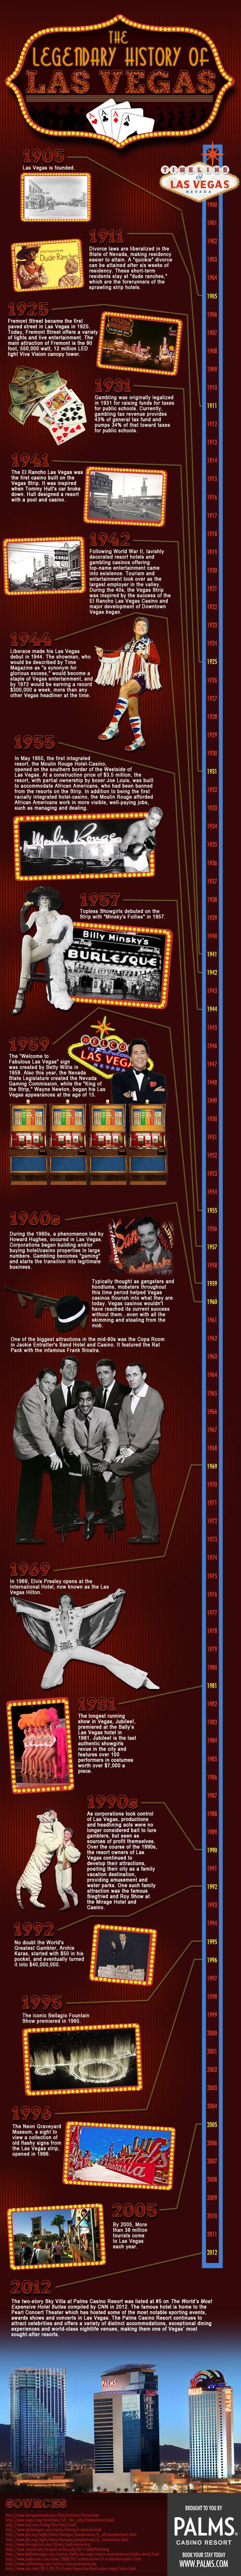 The Legendary History of Las Vegas [Infographic]